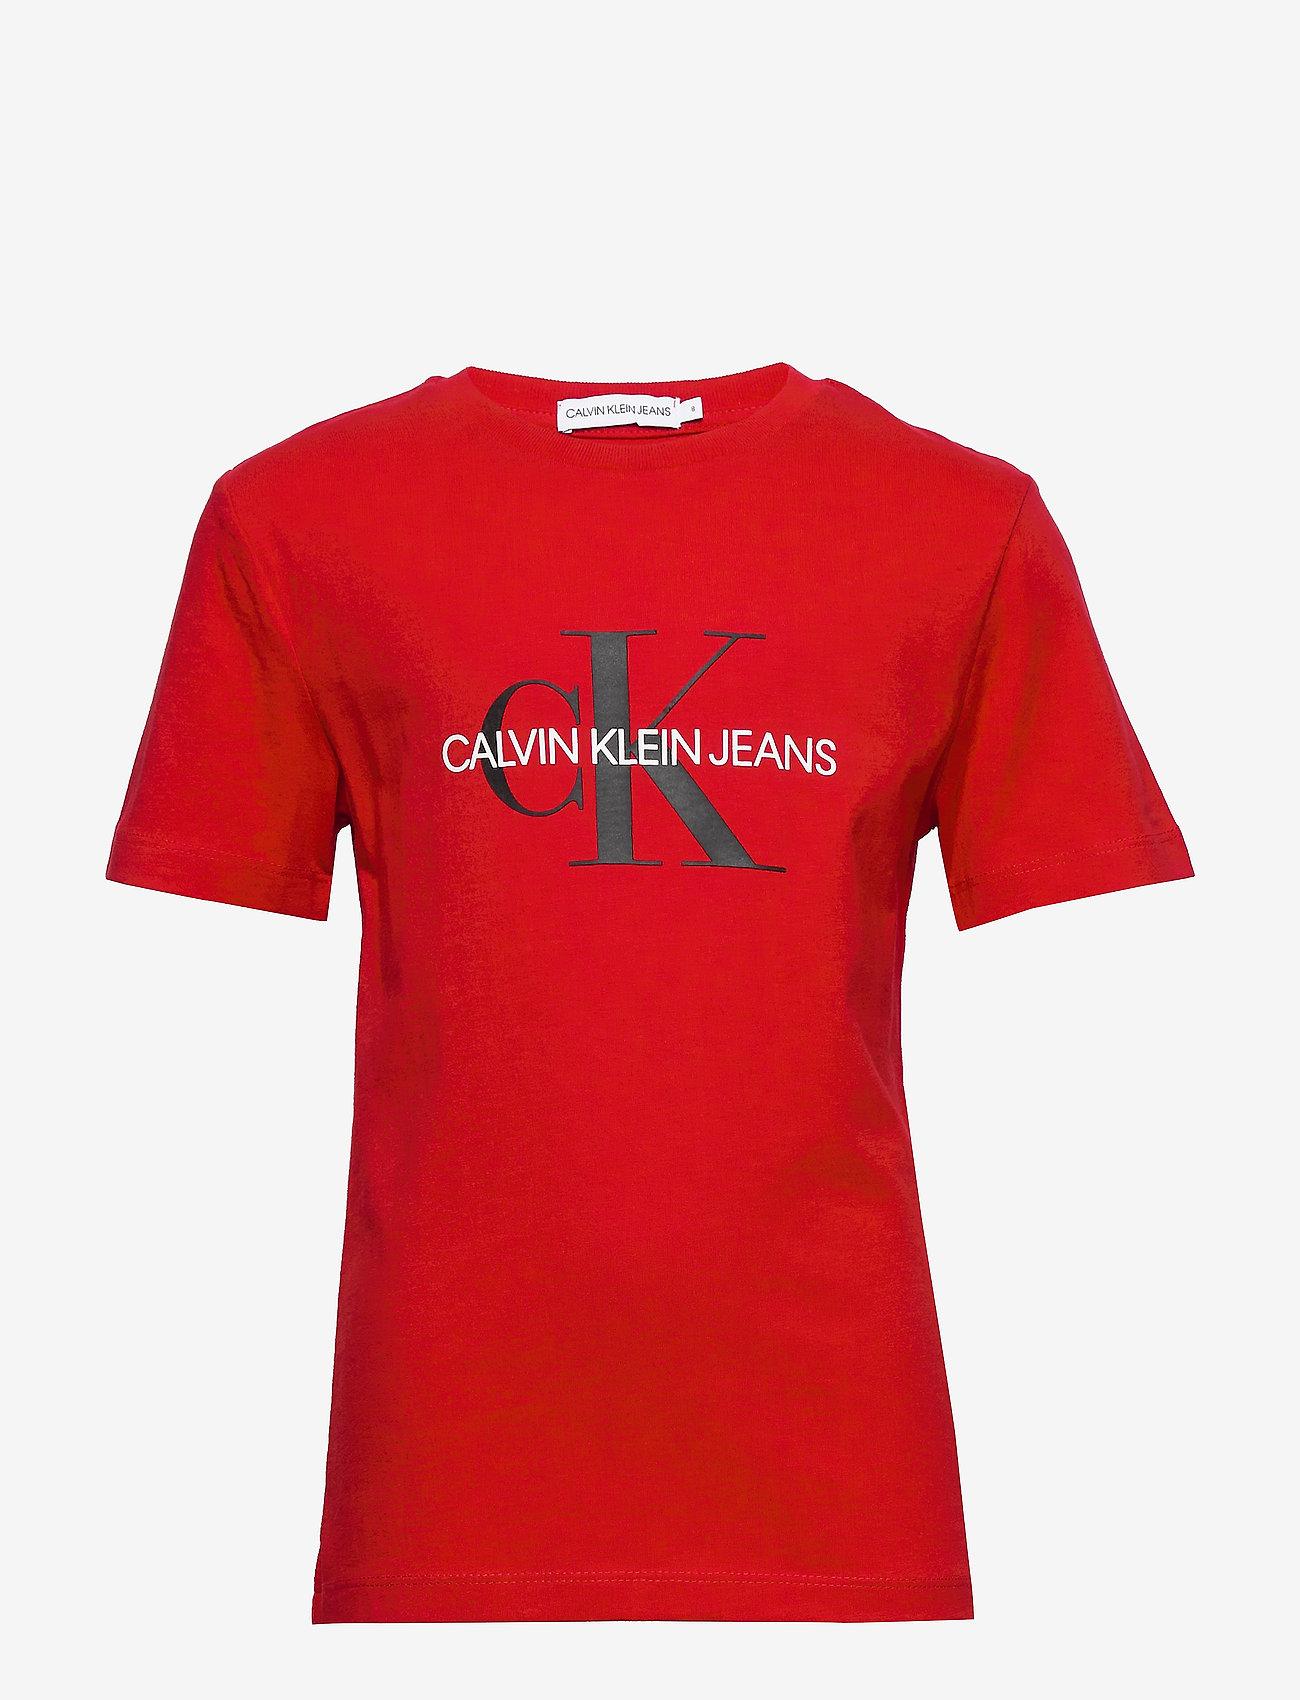 Calvin Klein - MONOGRAM LOGO T-SHIRT - korte mouwen - fierce red - 0